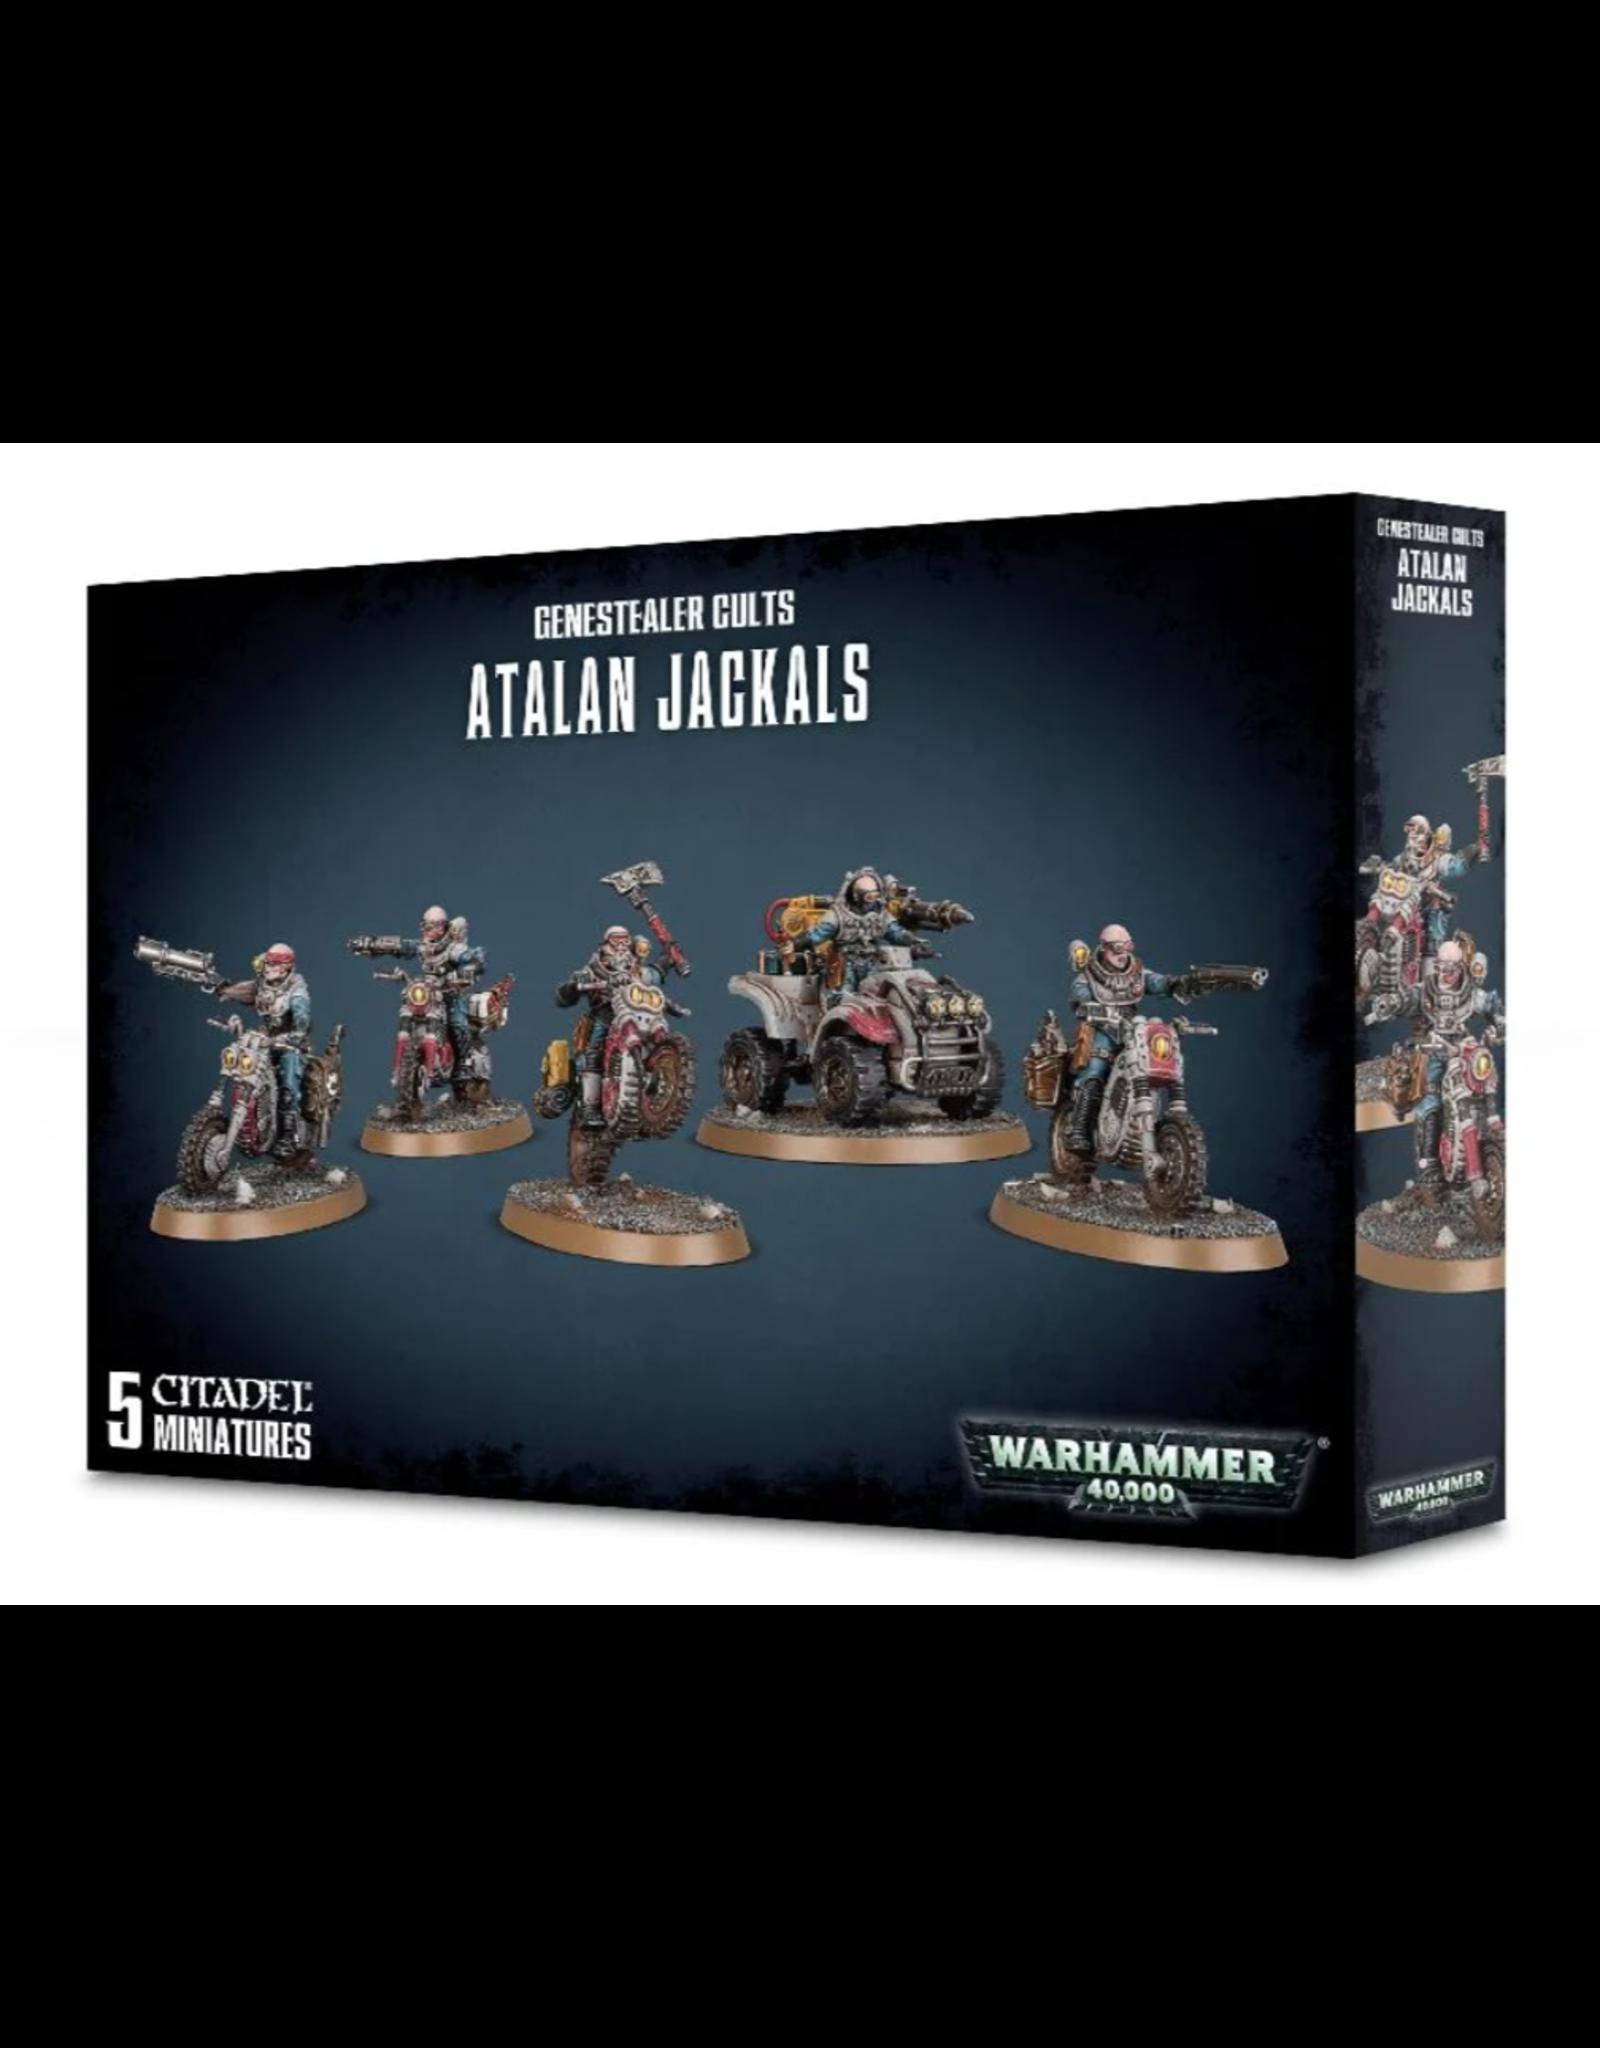 Warhammer 40K Genestealer Cults Atalan Jackals